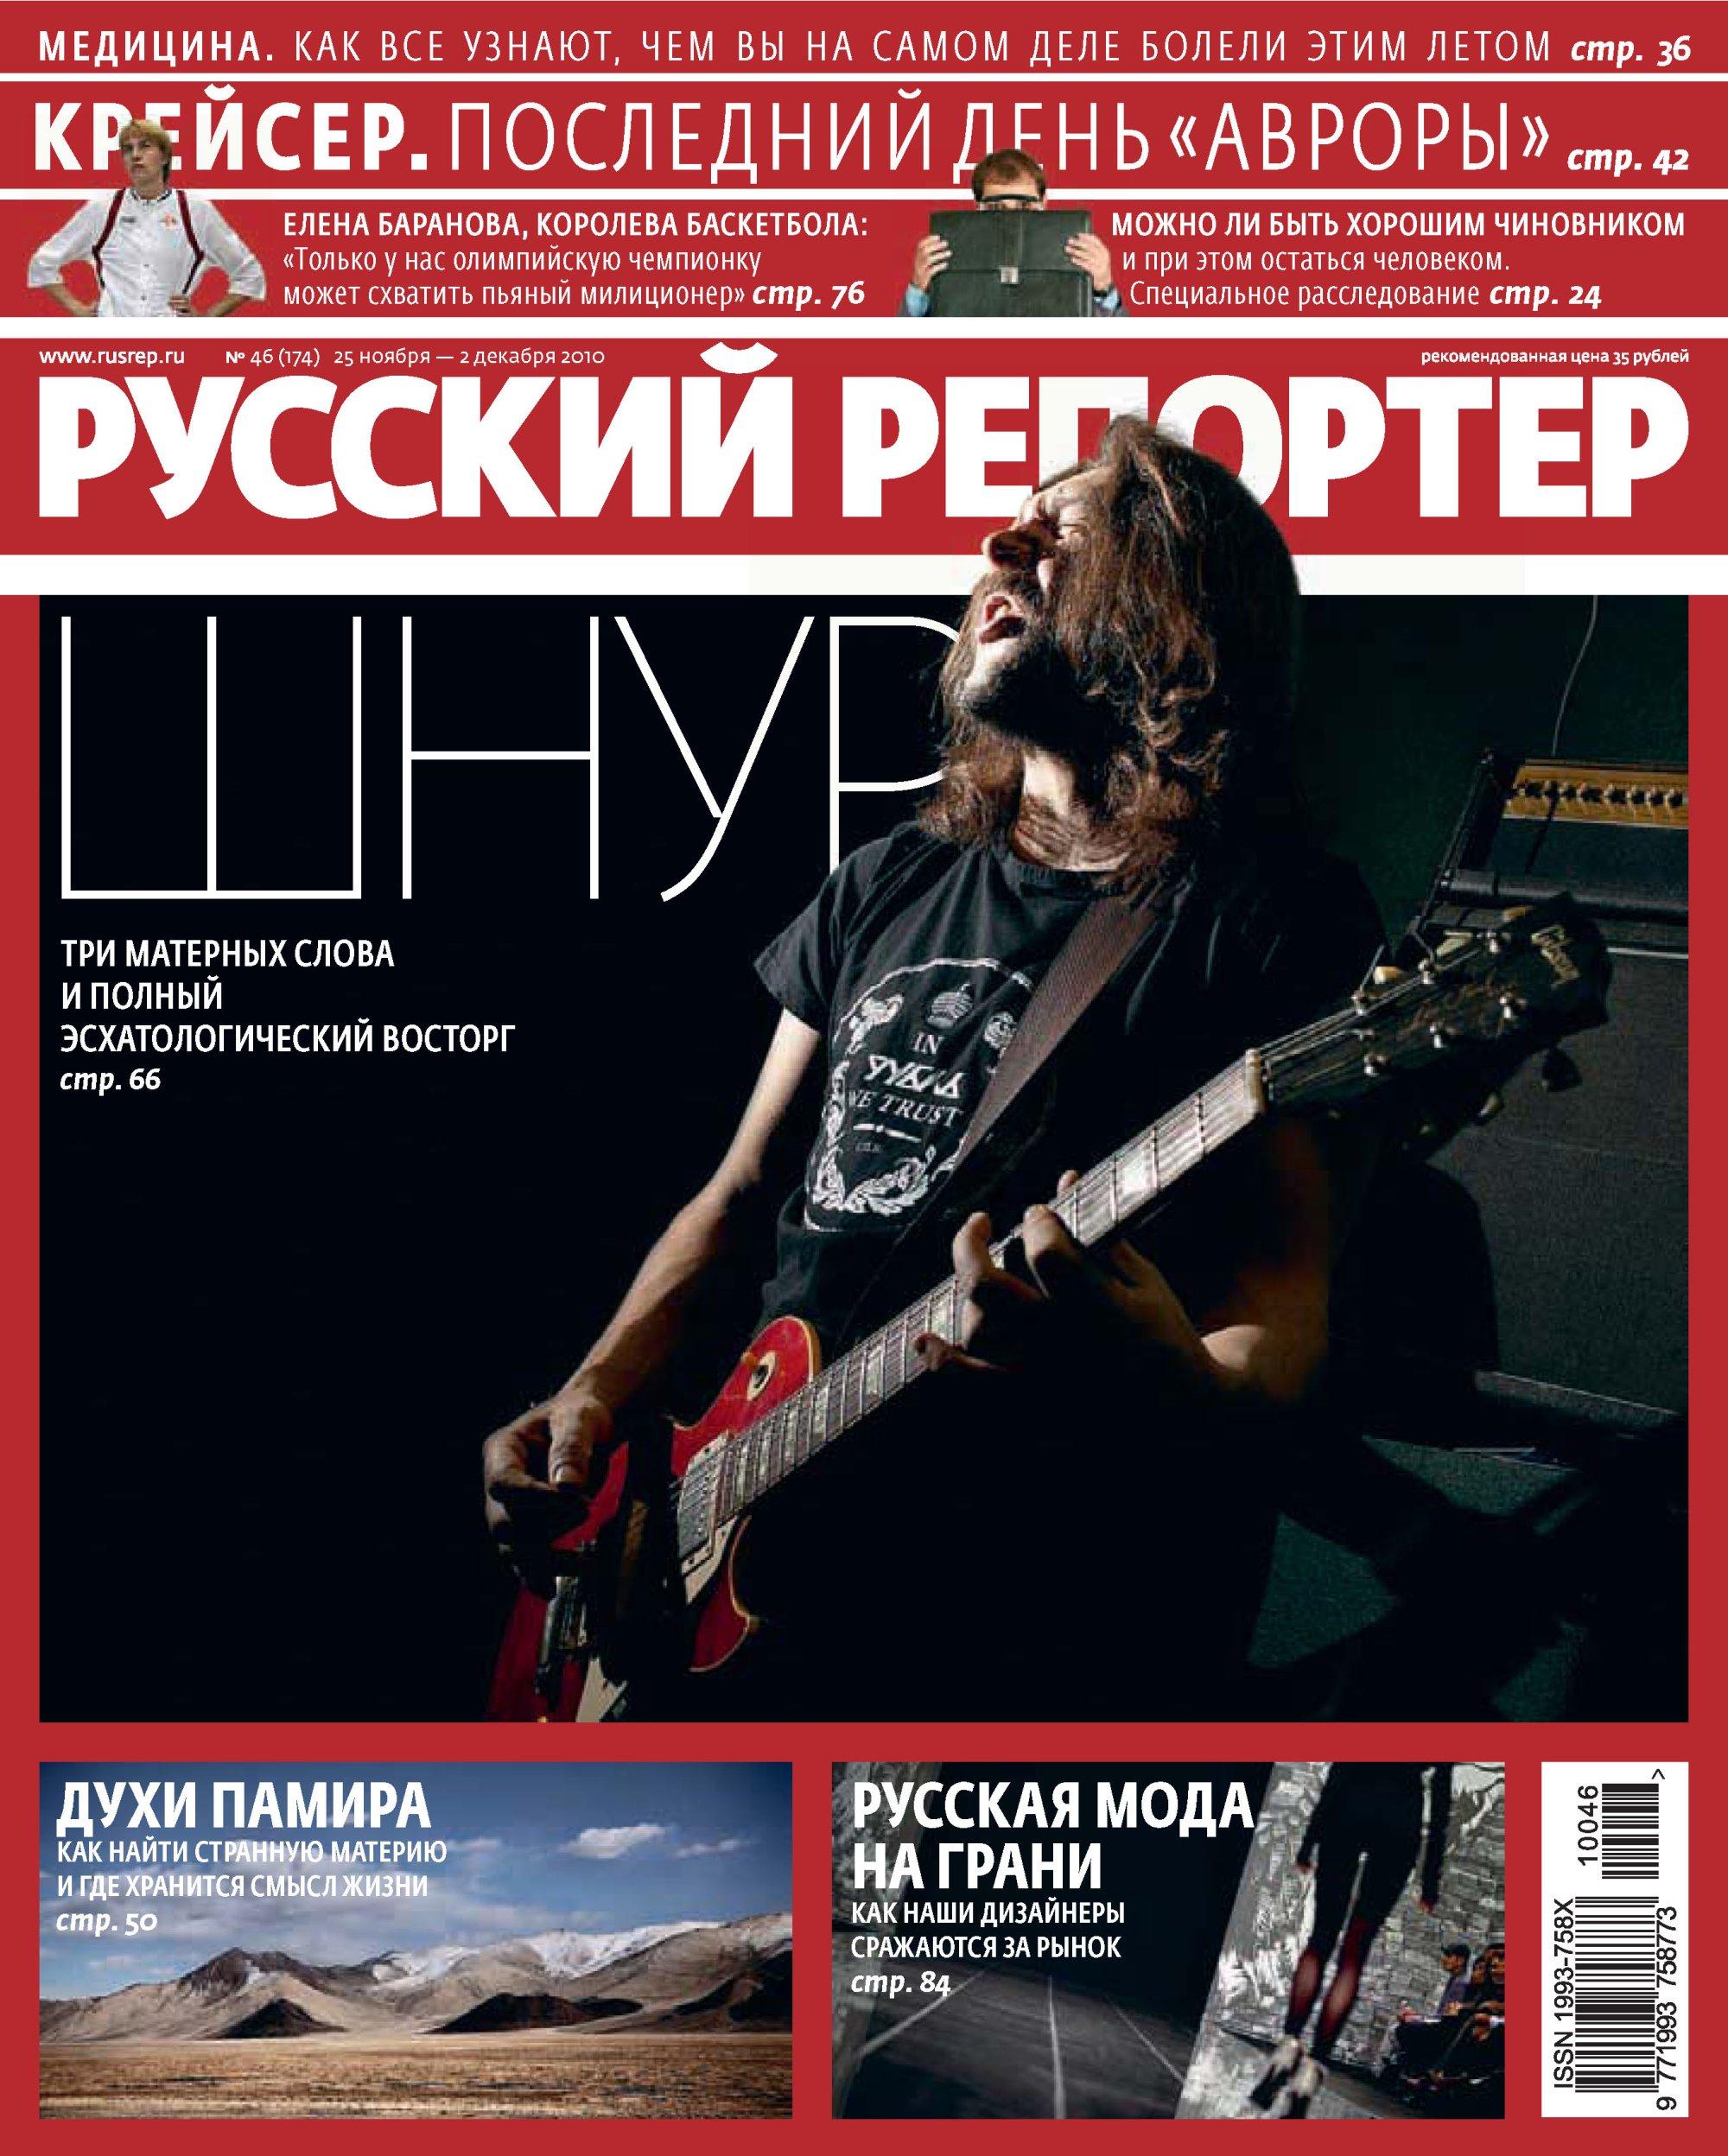 Русский Репортер №46/2010